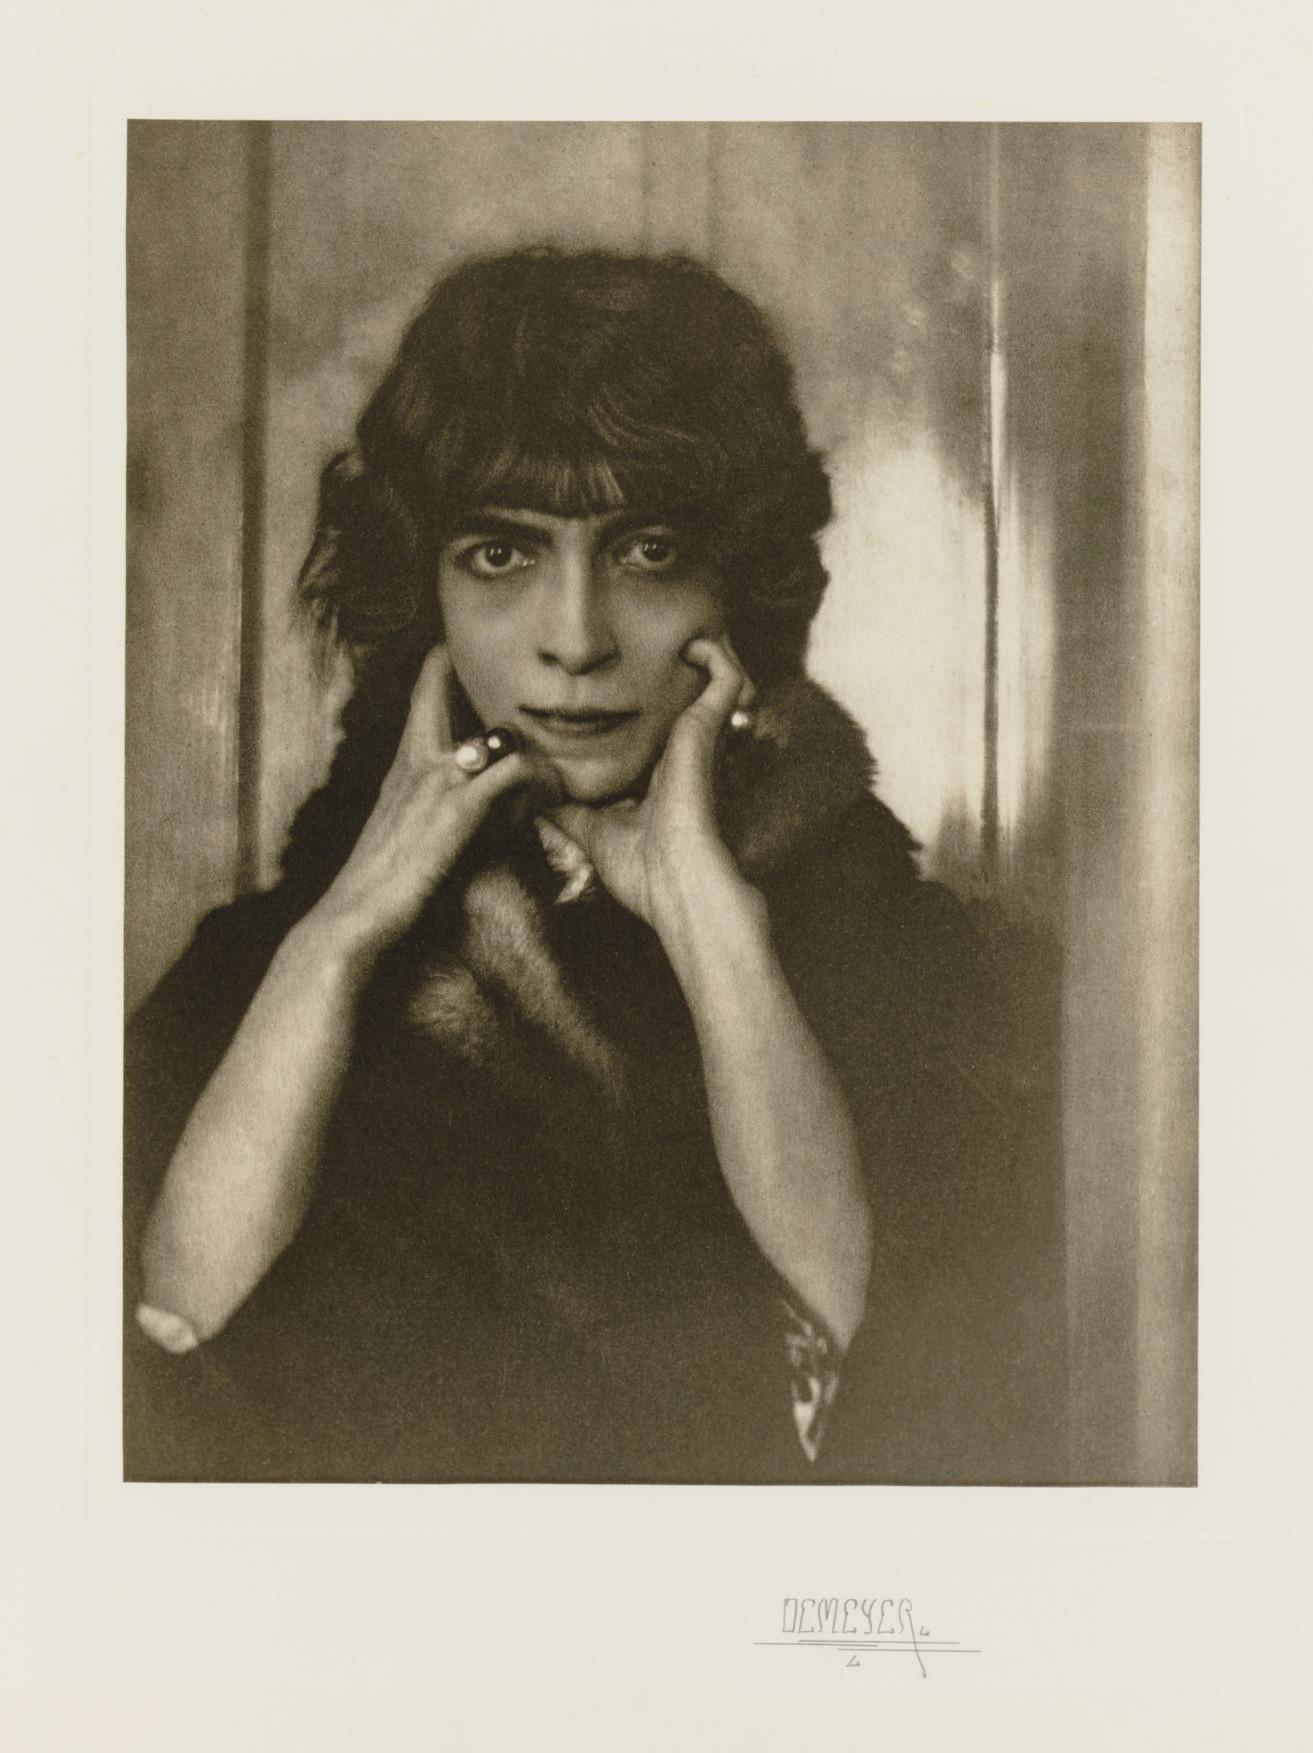 Portrait of the Marchesa Luisa Casati, 1912